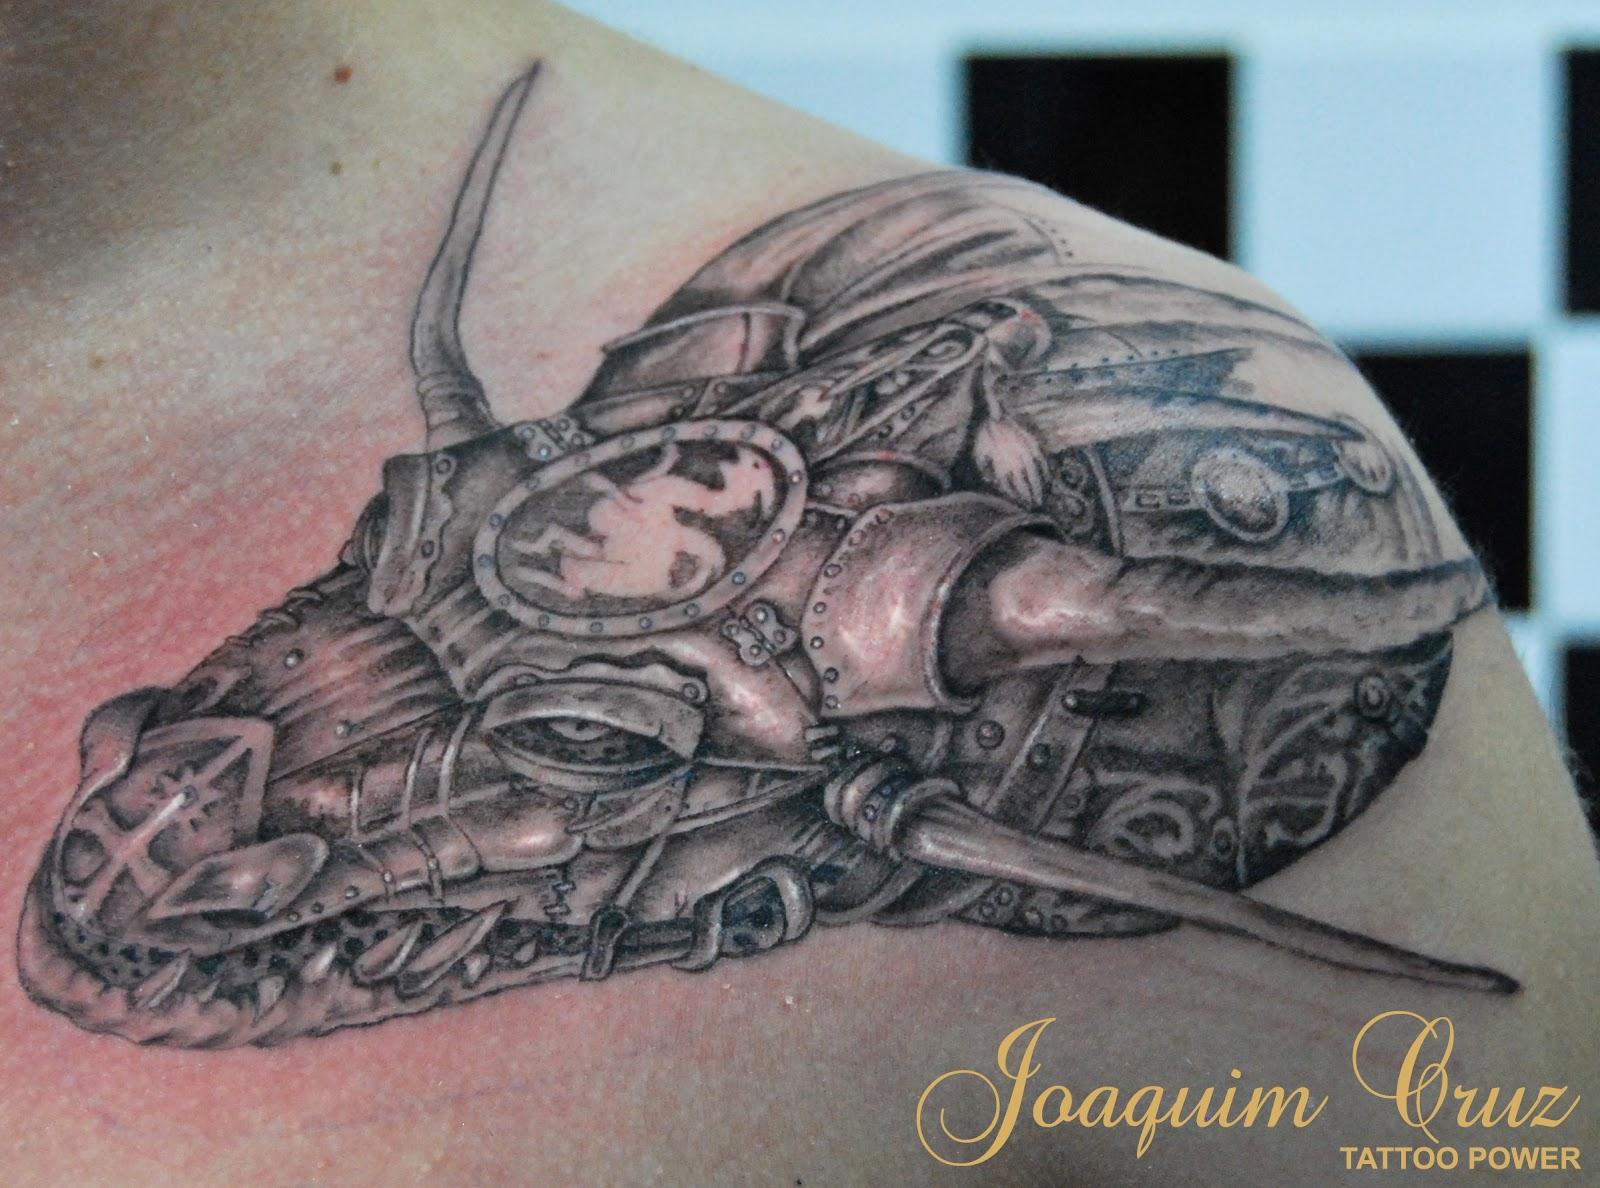 http://3.bp.blogspot.com/-LU0825QUmKk/UHhlBxK-ukI/AAAAAAAAEa0/PT1DK8d7eAI/s1600/dragon+dragao+tattoo+power+lojas+de+tatuagens+estudios+de+tatuagens+porto+matosinhos+portugal+joaquim+cruz+melhor+tatuador+best+tattoo+artist++best+shop.JPG